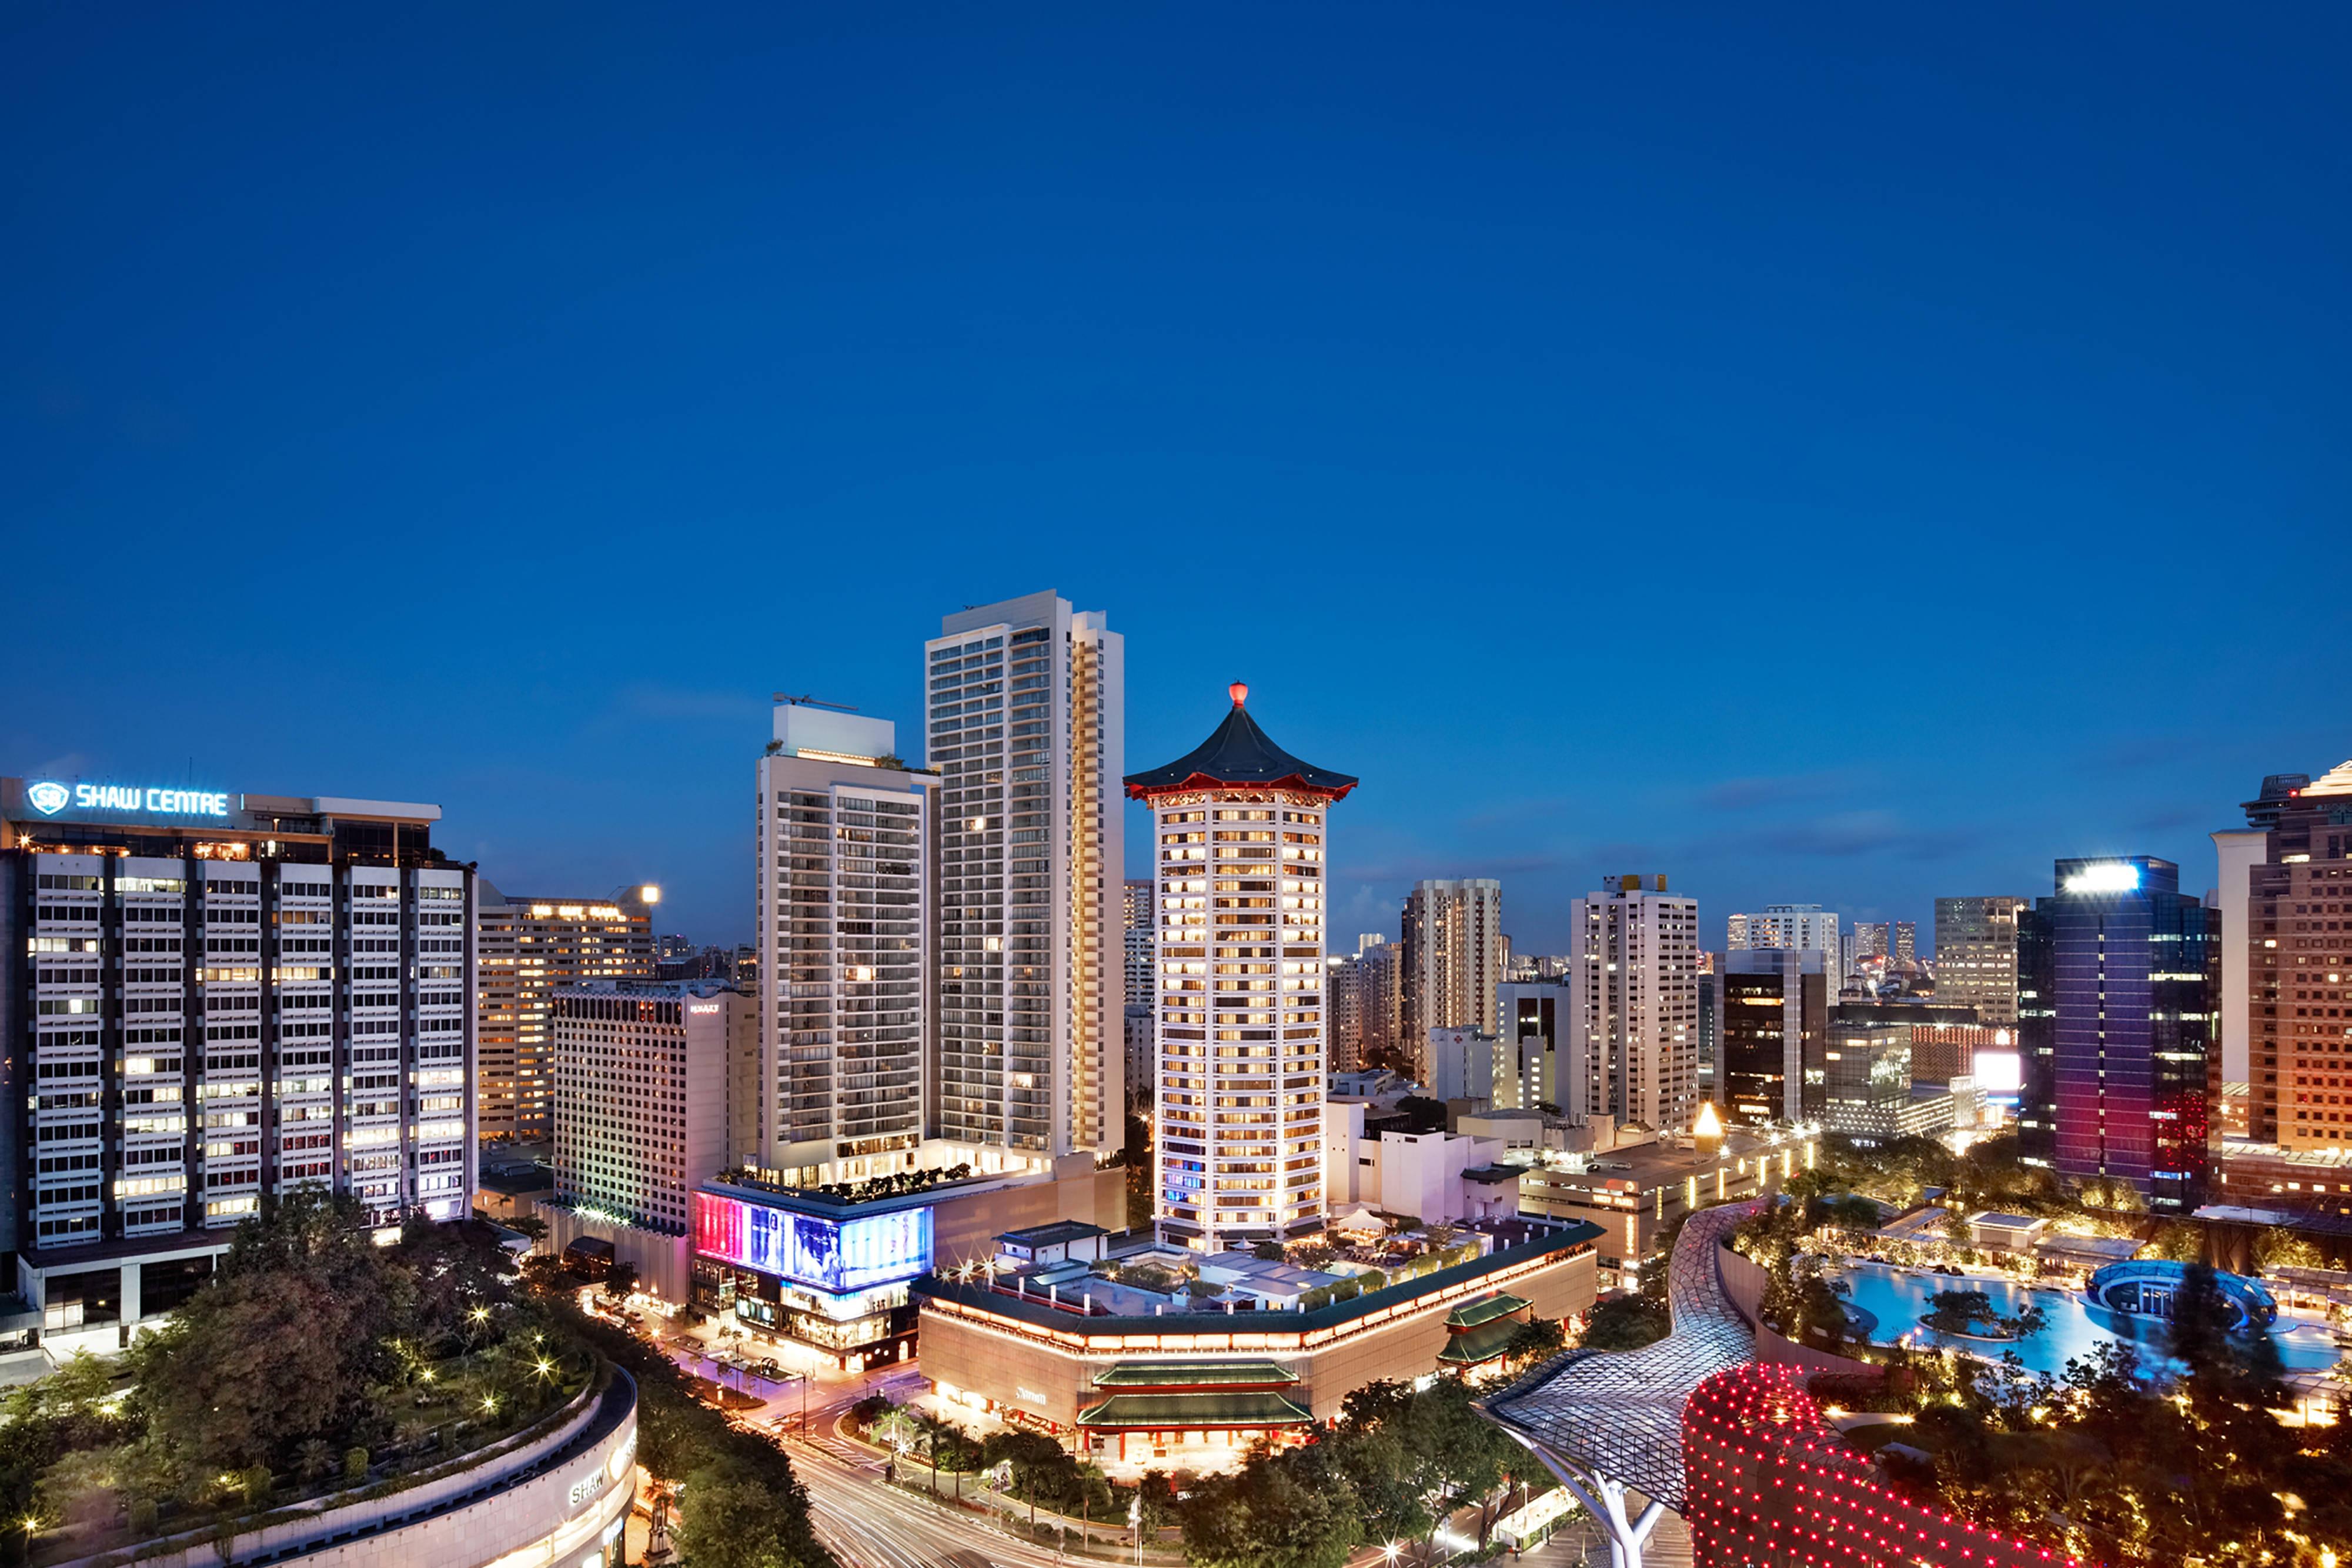 Luxury hotel in Singapore